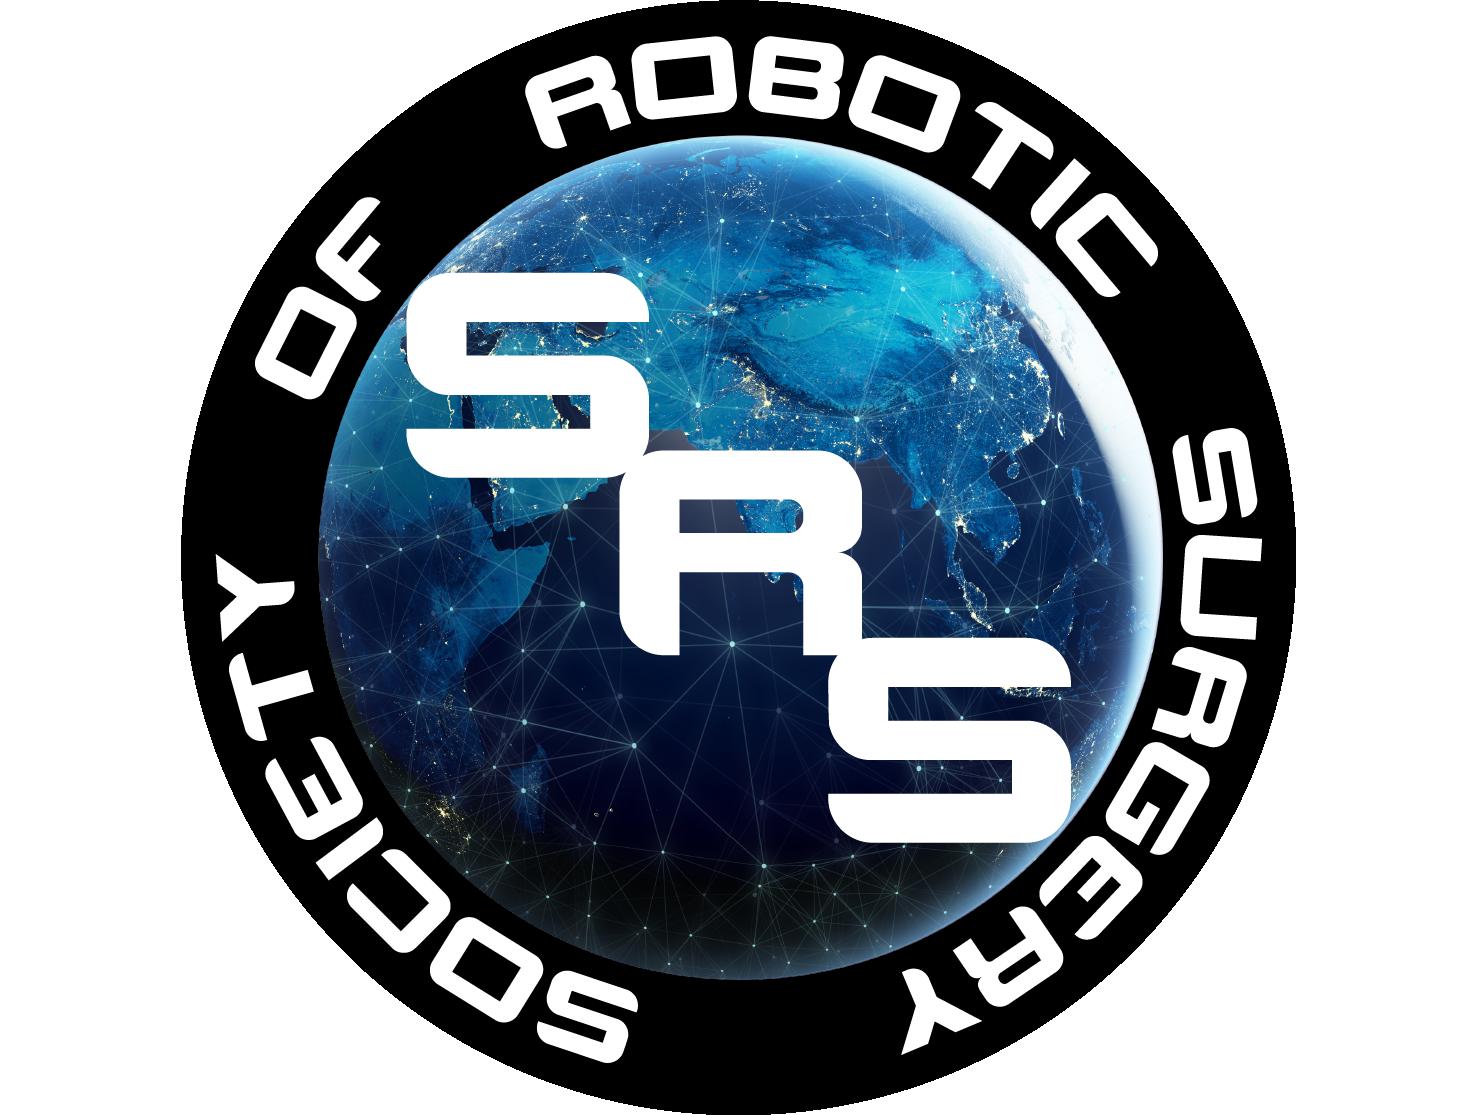 Society of Robotic Surgery